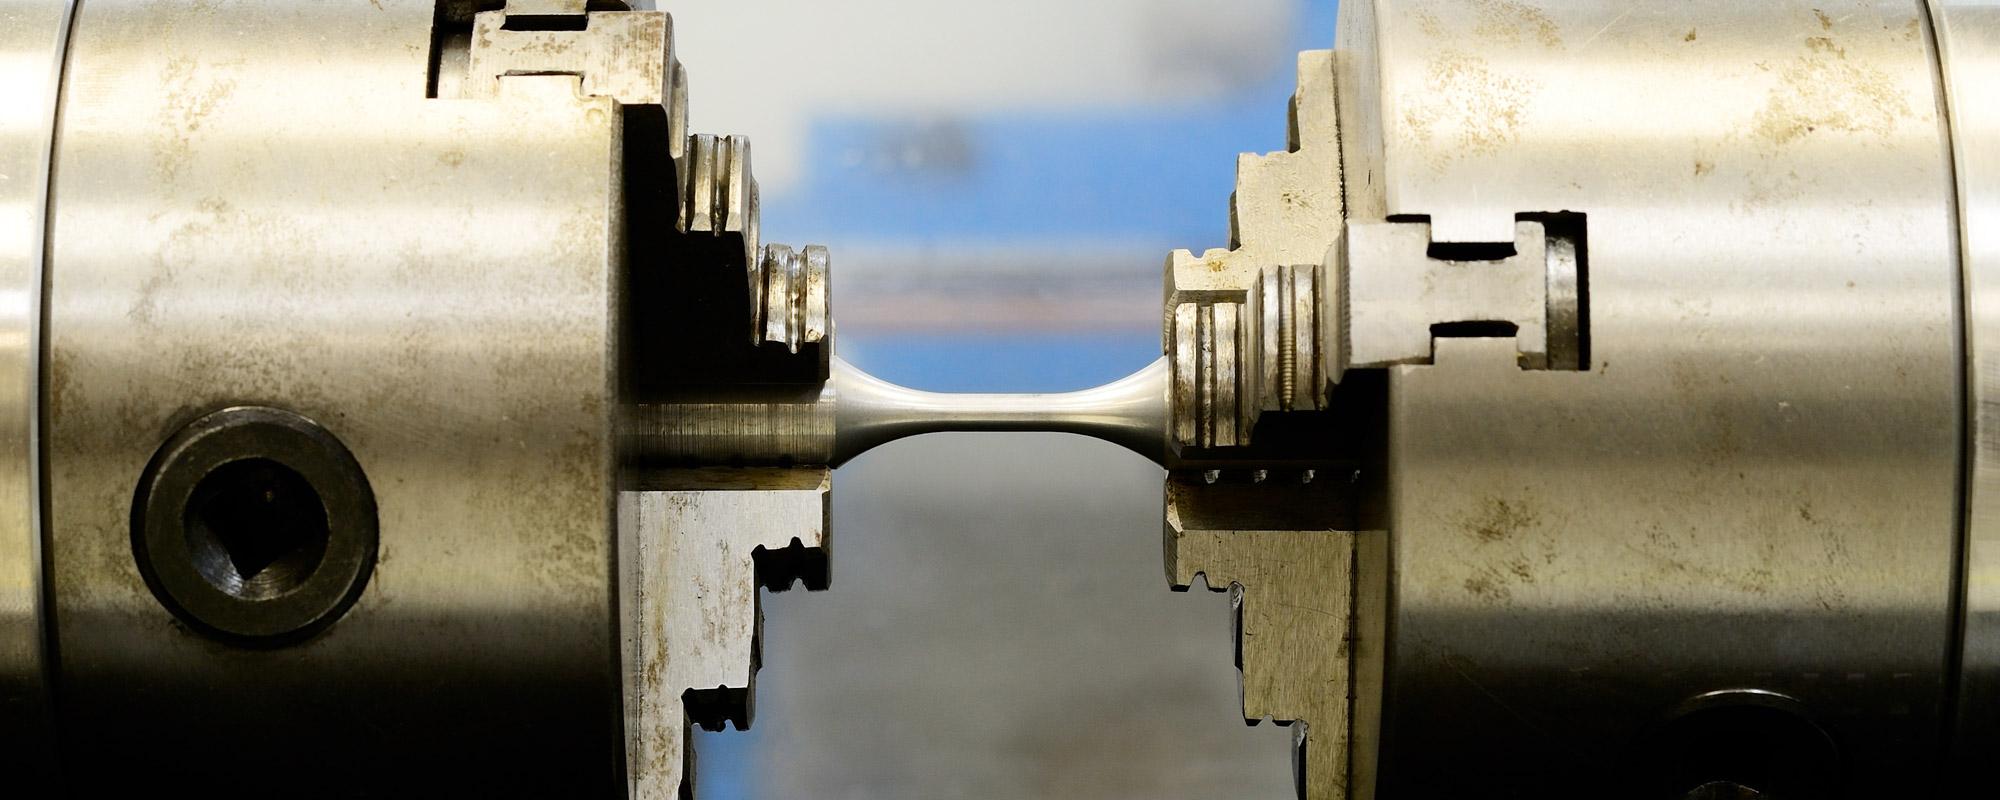 Unit Conversion Calculator Converter for Tensile Yield